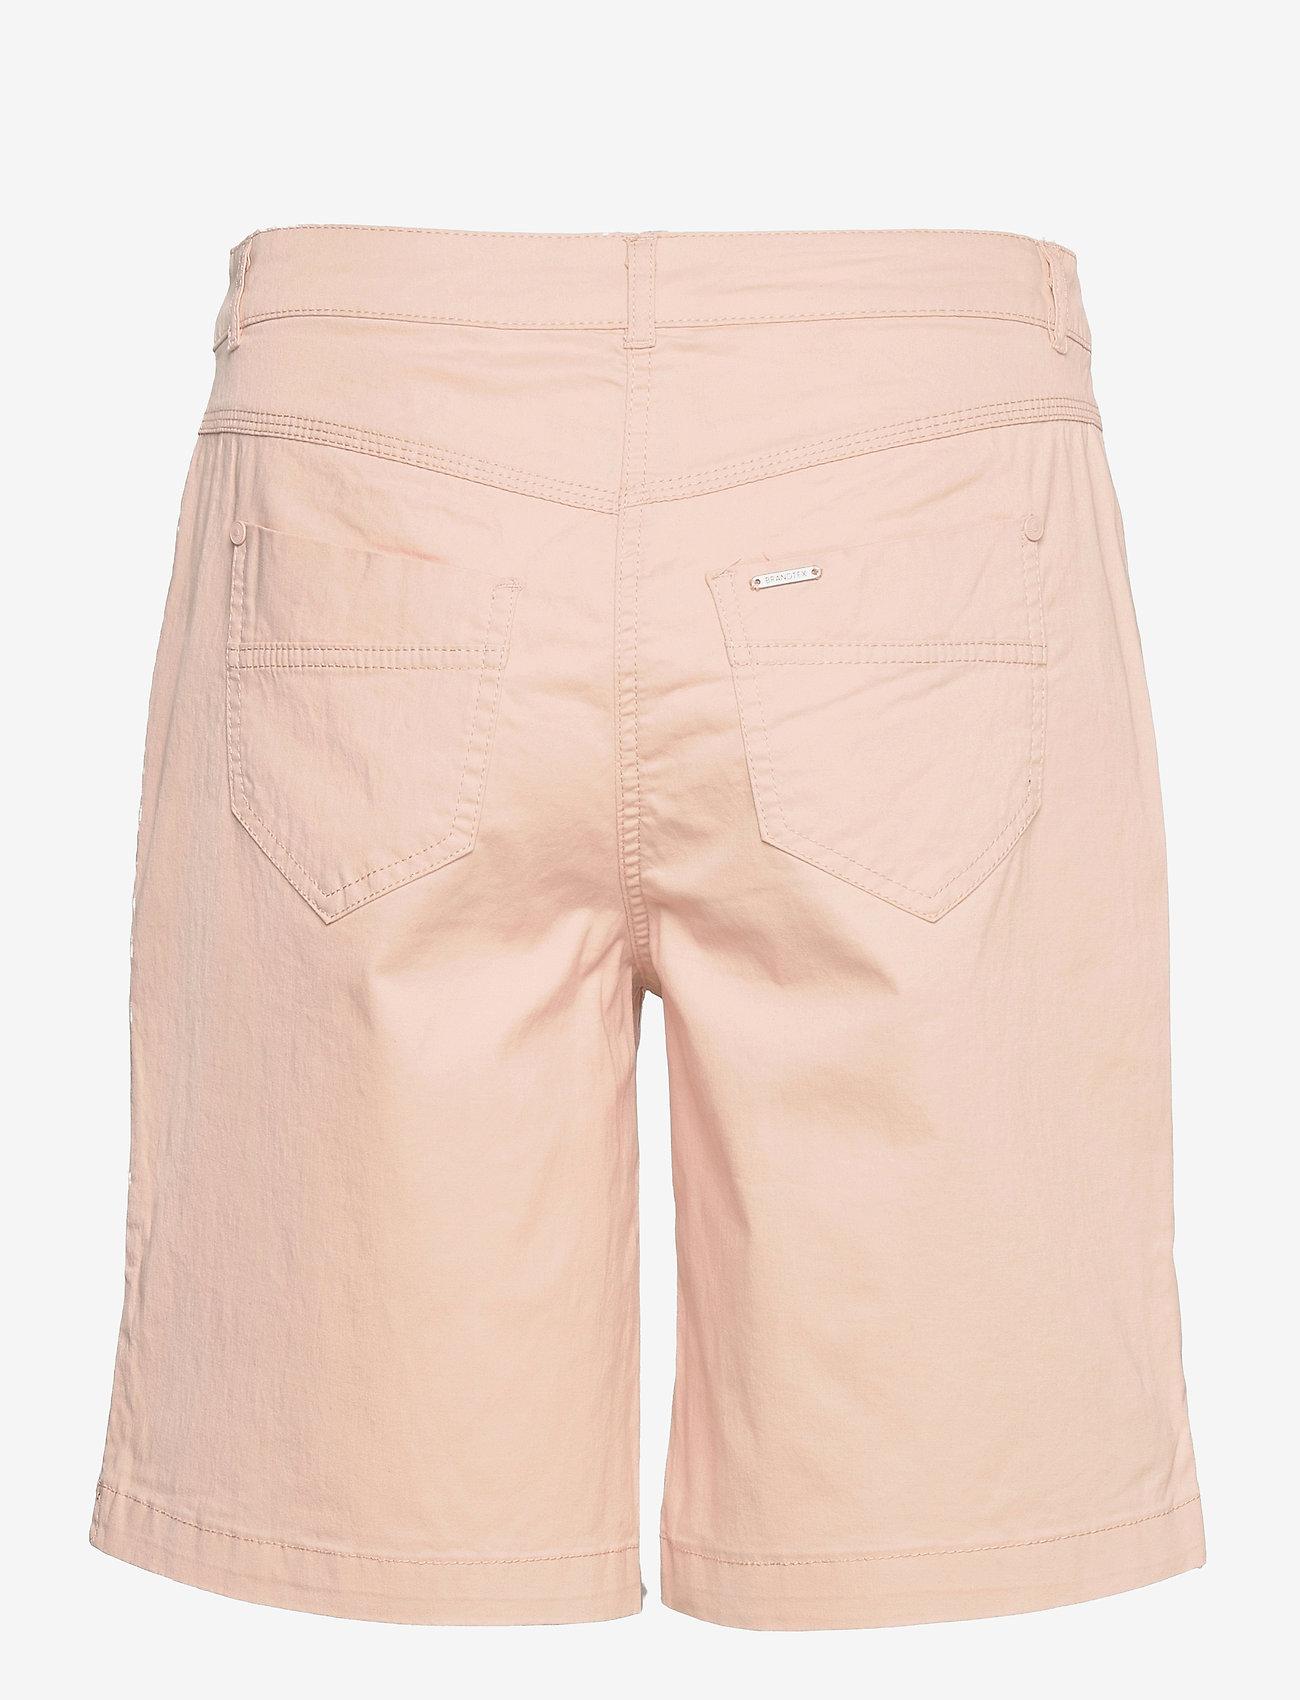 Brandtex - Casual shorts - chino shorts - pale blush - 1